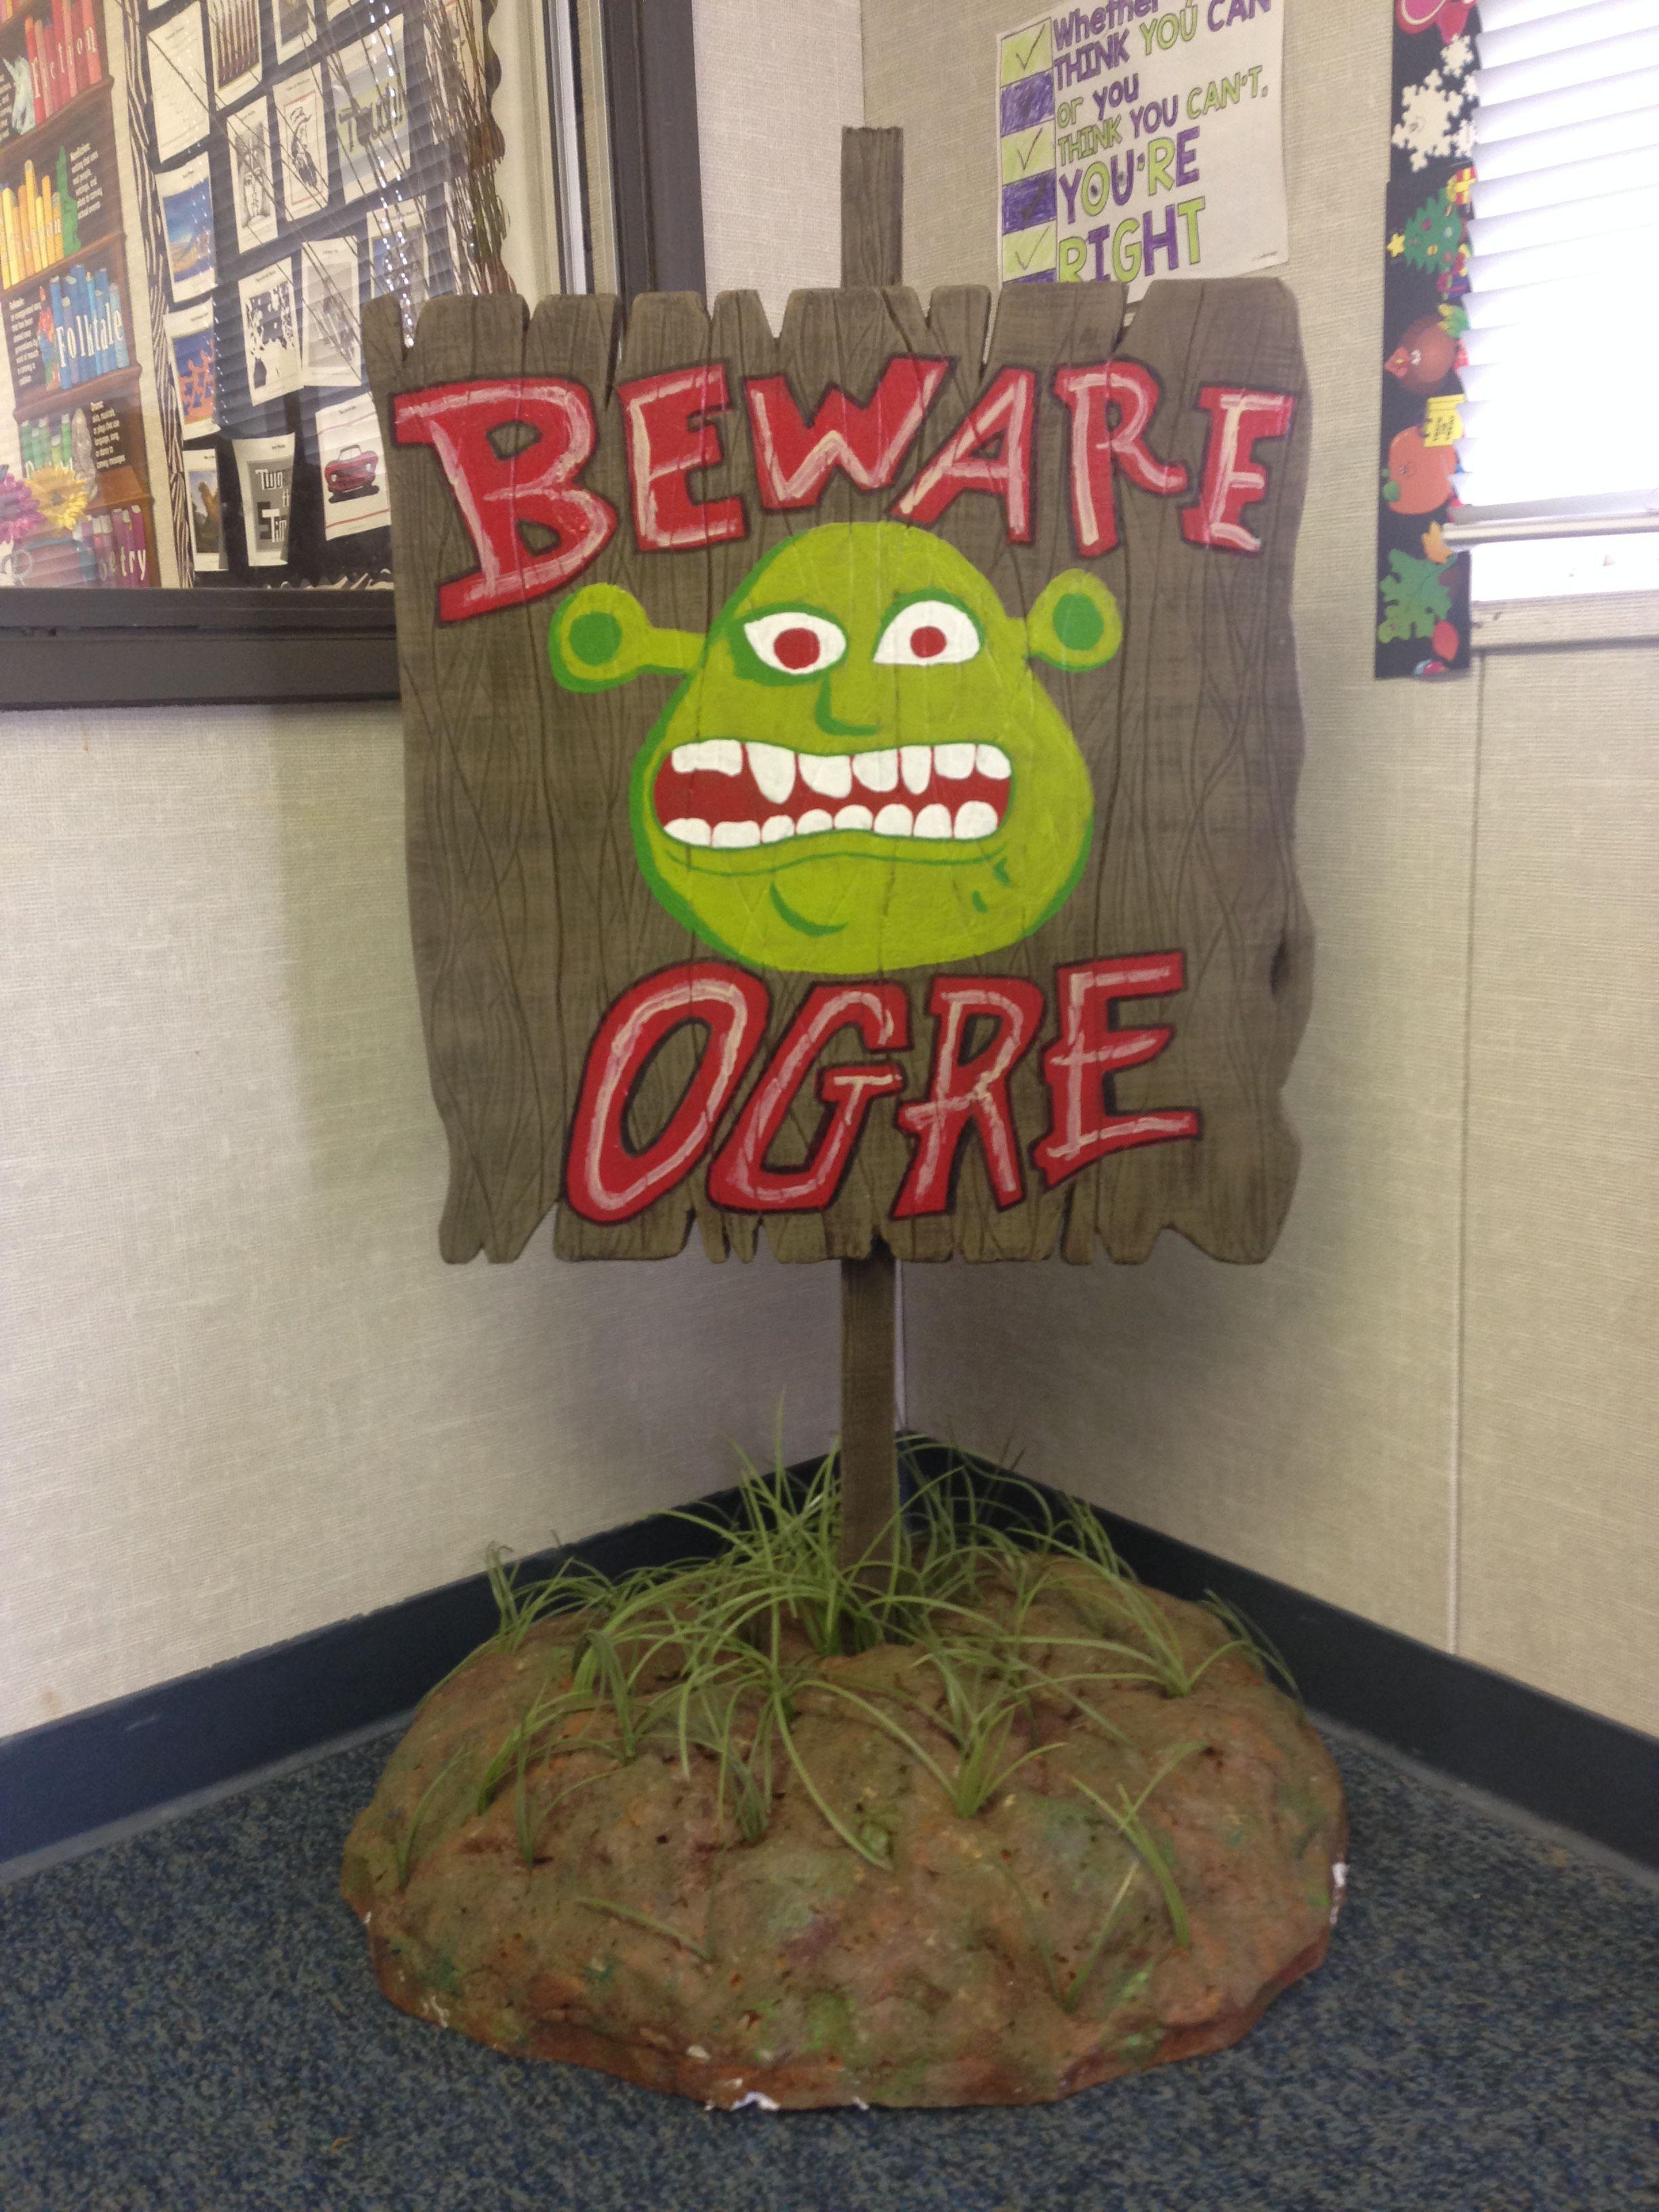 ee7a6c60 Beware ogre sign prop for Shrek the Musical jr. | Performing Arts ...